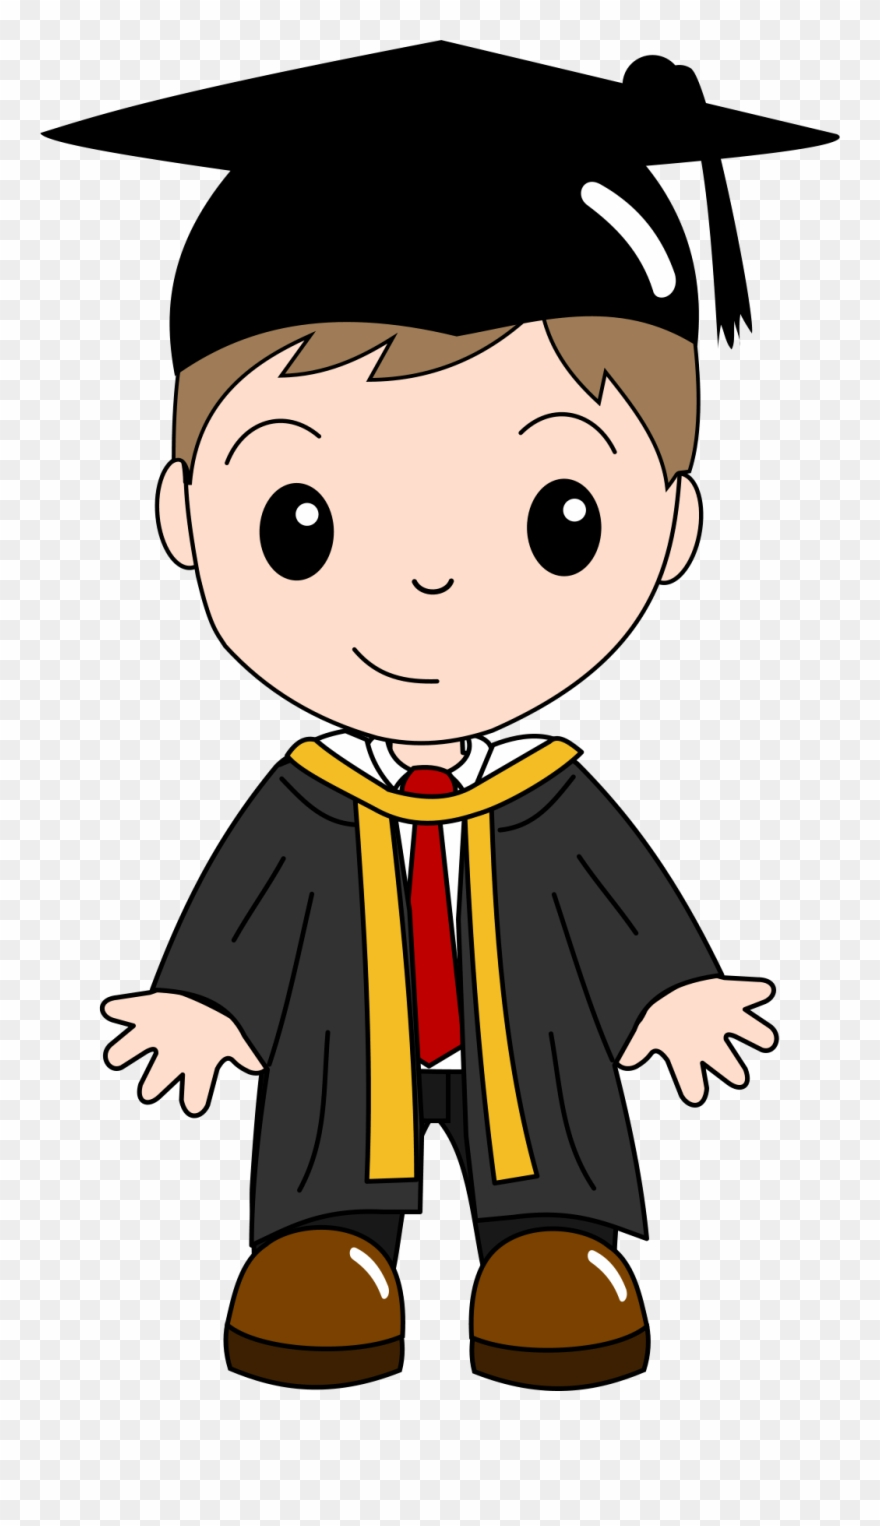 Graduation clipart boy. Ceremony cartoon clip